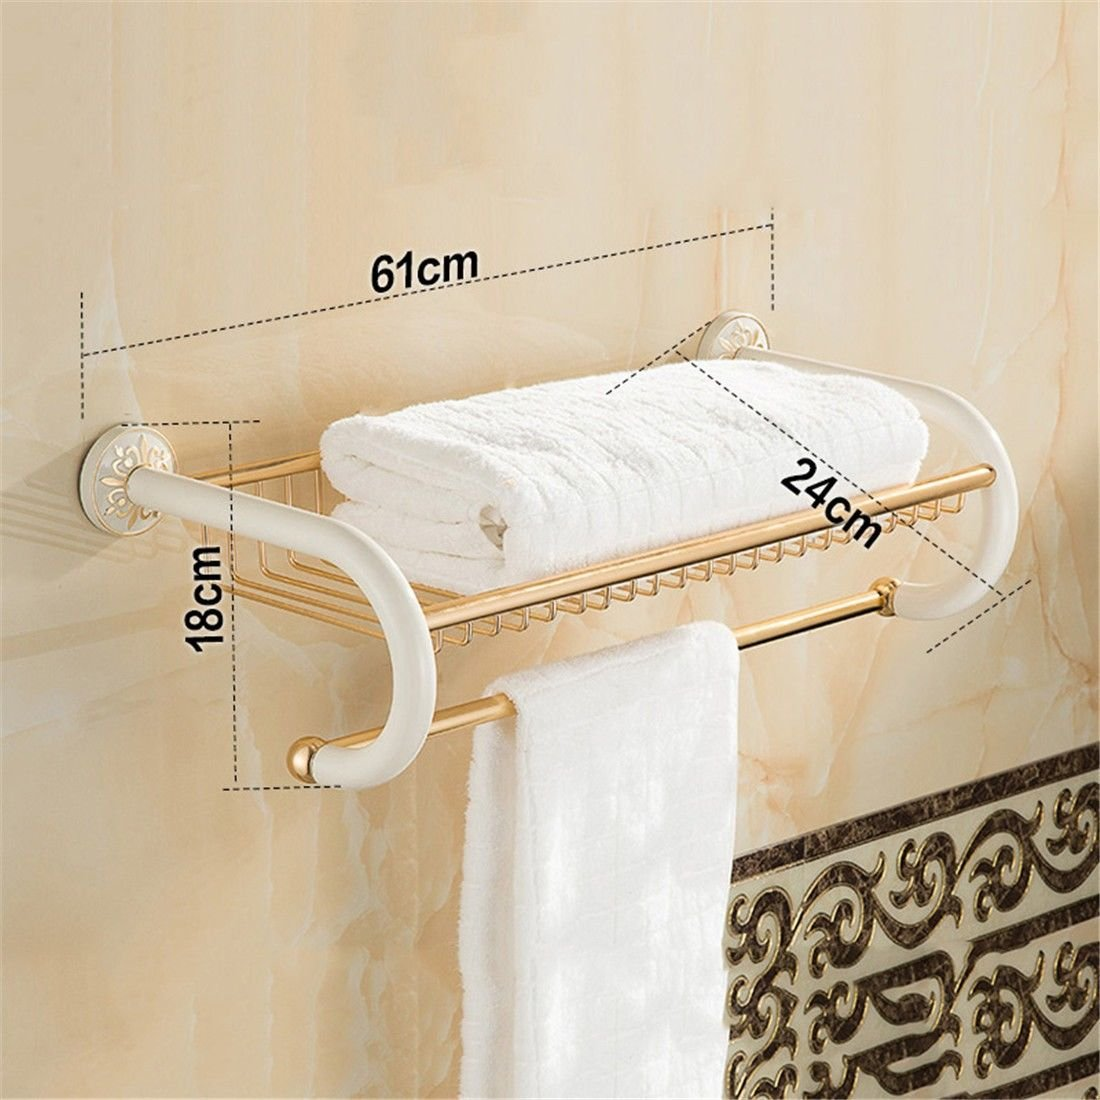 Yomiokla Bathroom Accessories - Kitchen, Toilet, Balcony and Bathroom Metal Towel Ring European White Space Aluminum Mount, Built-in Shelf 3